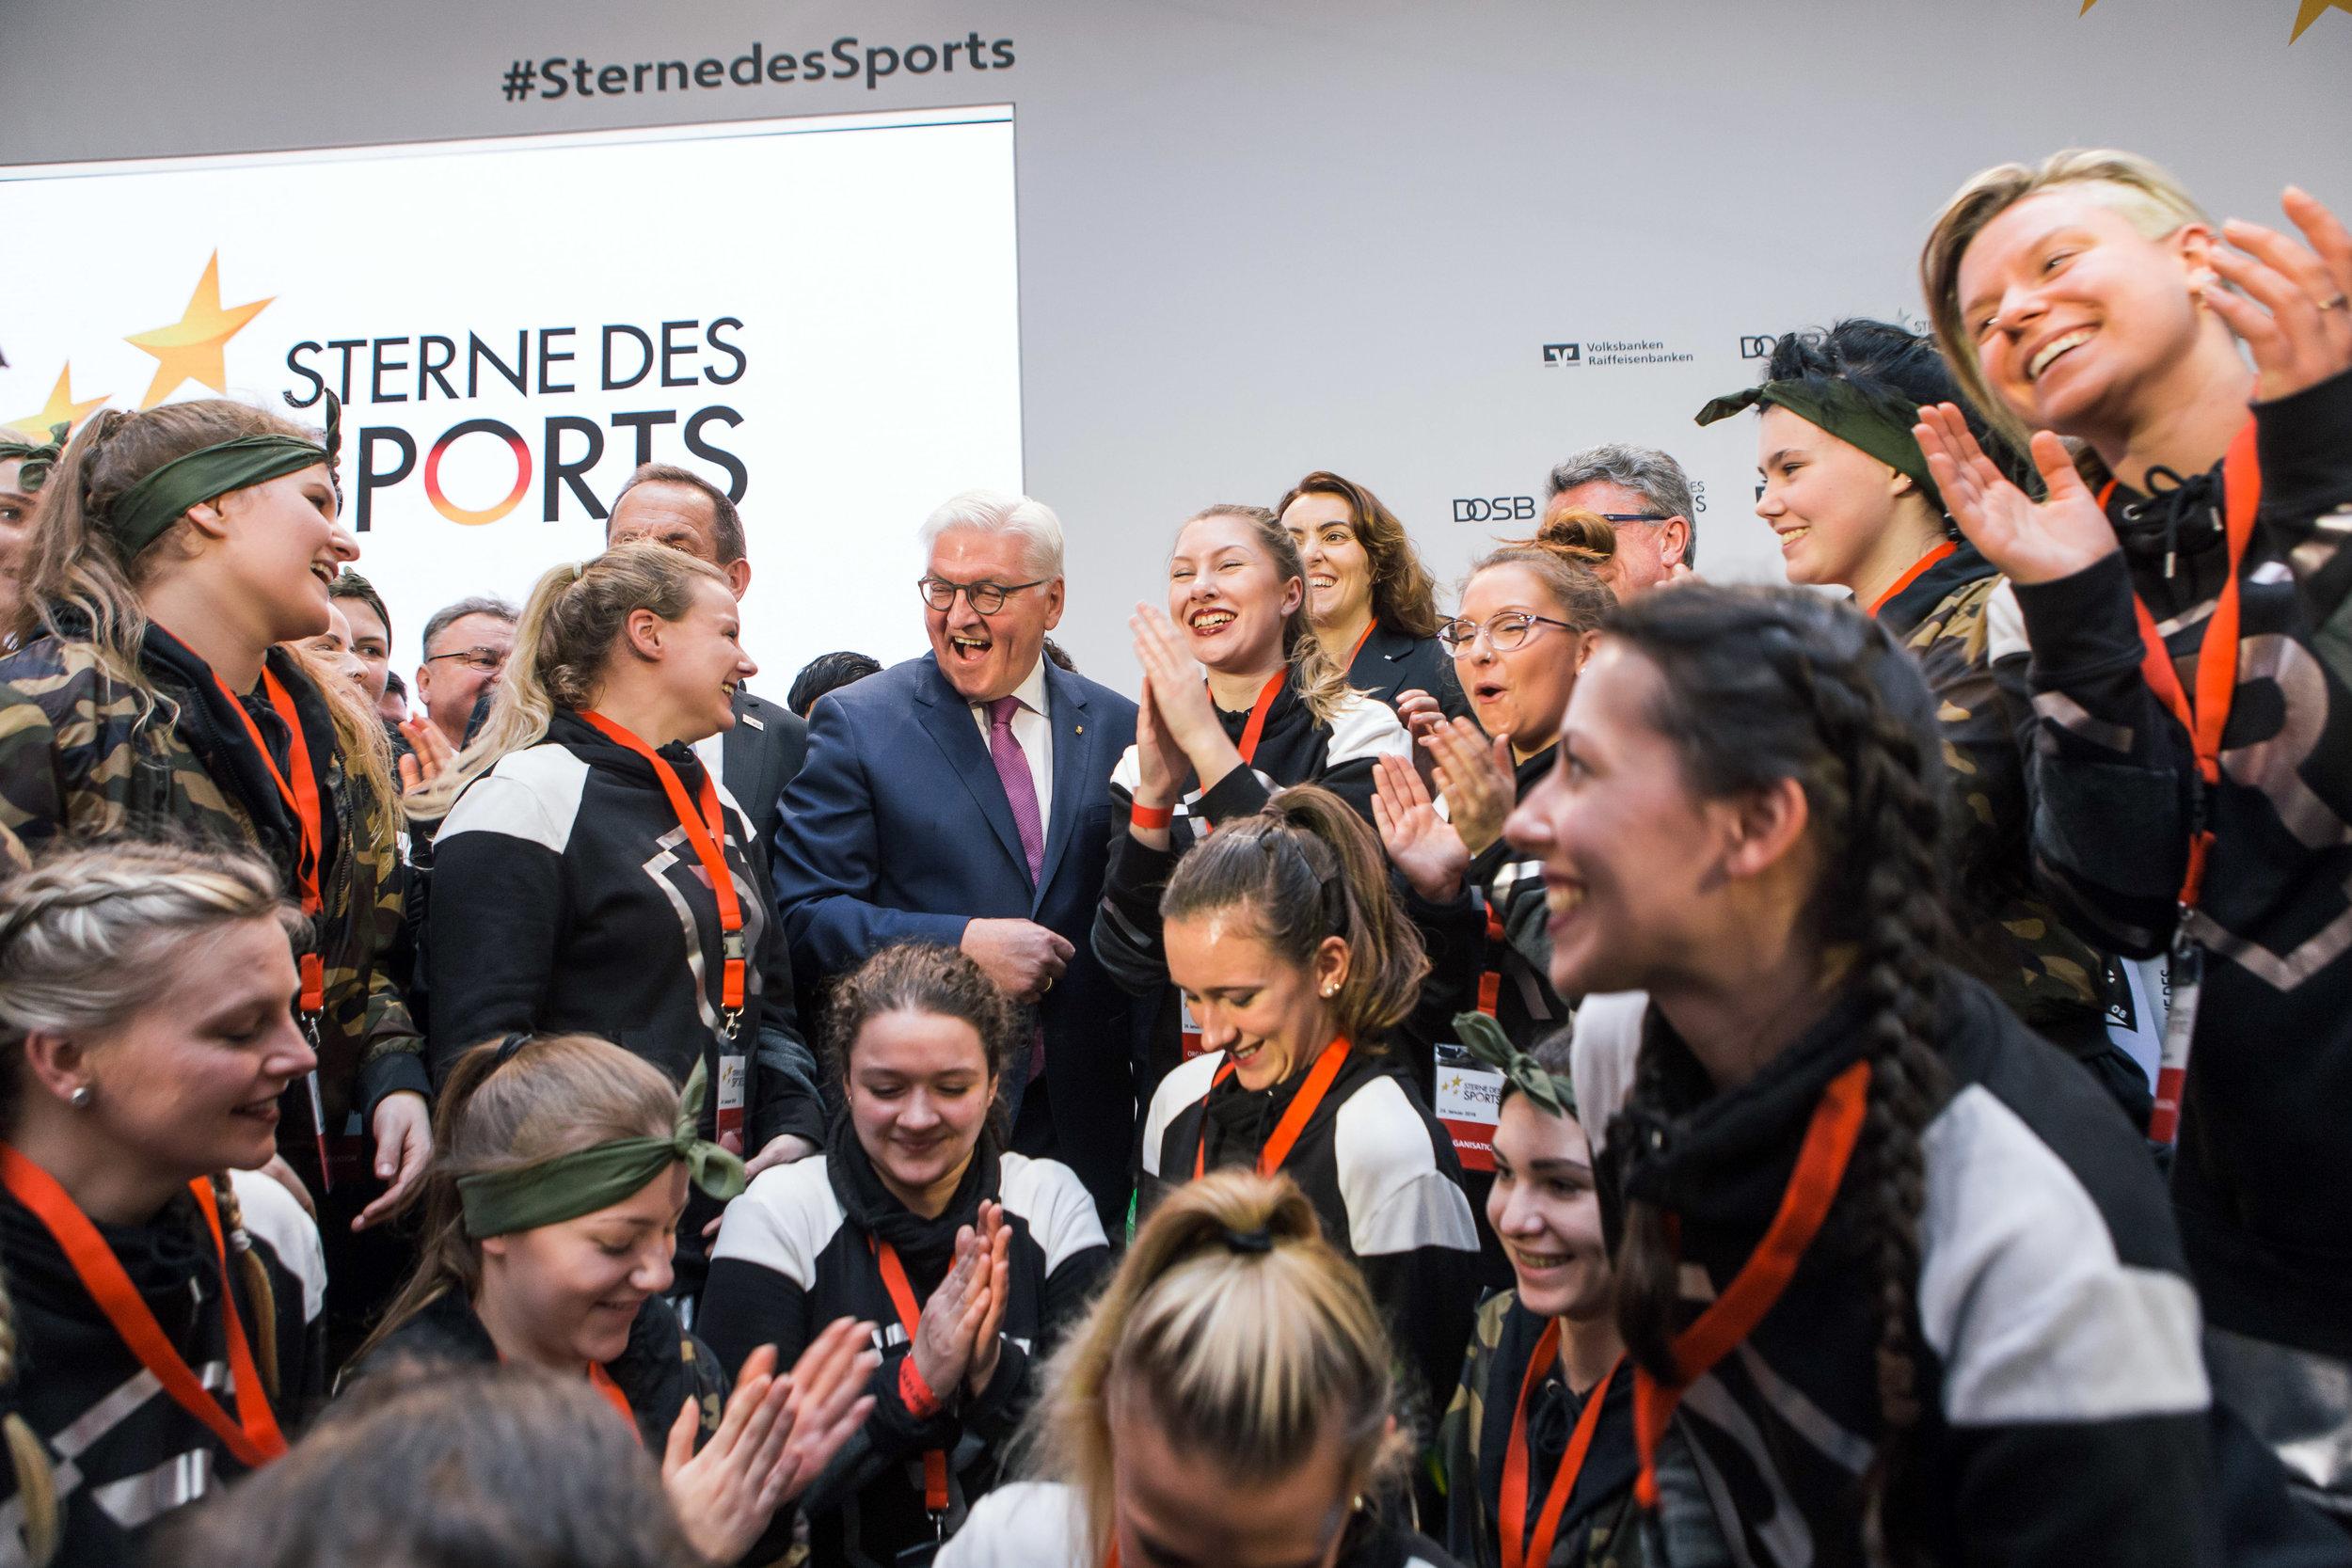 41_sterne_des_sports.jpg